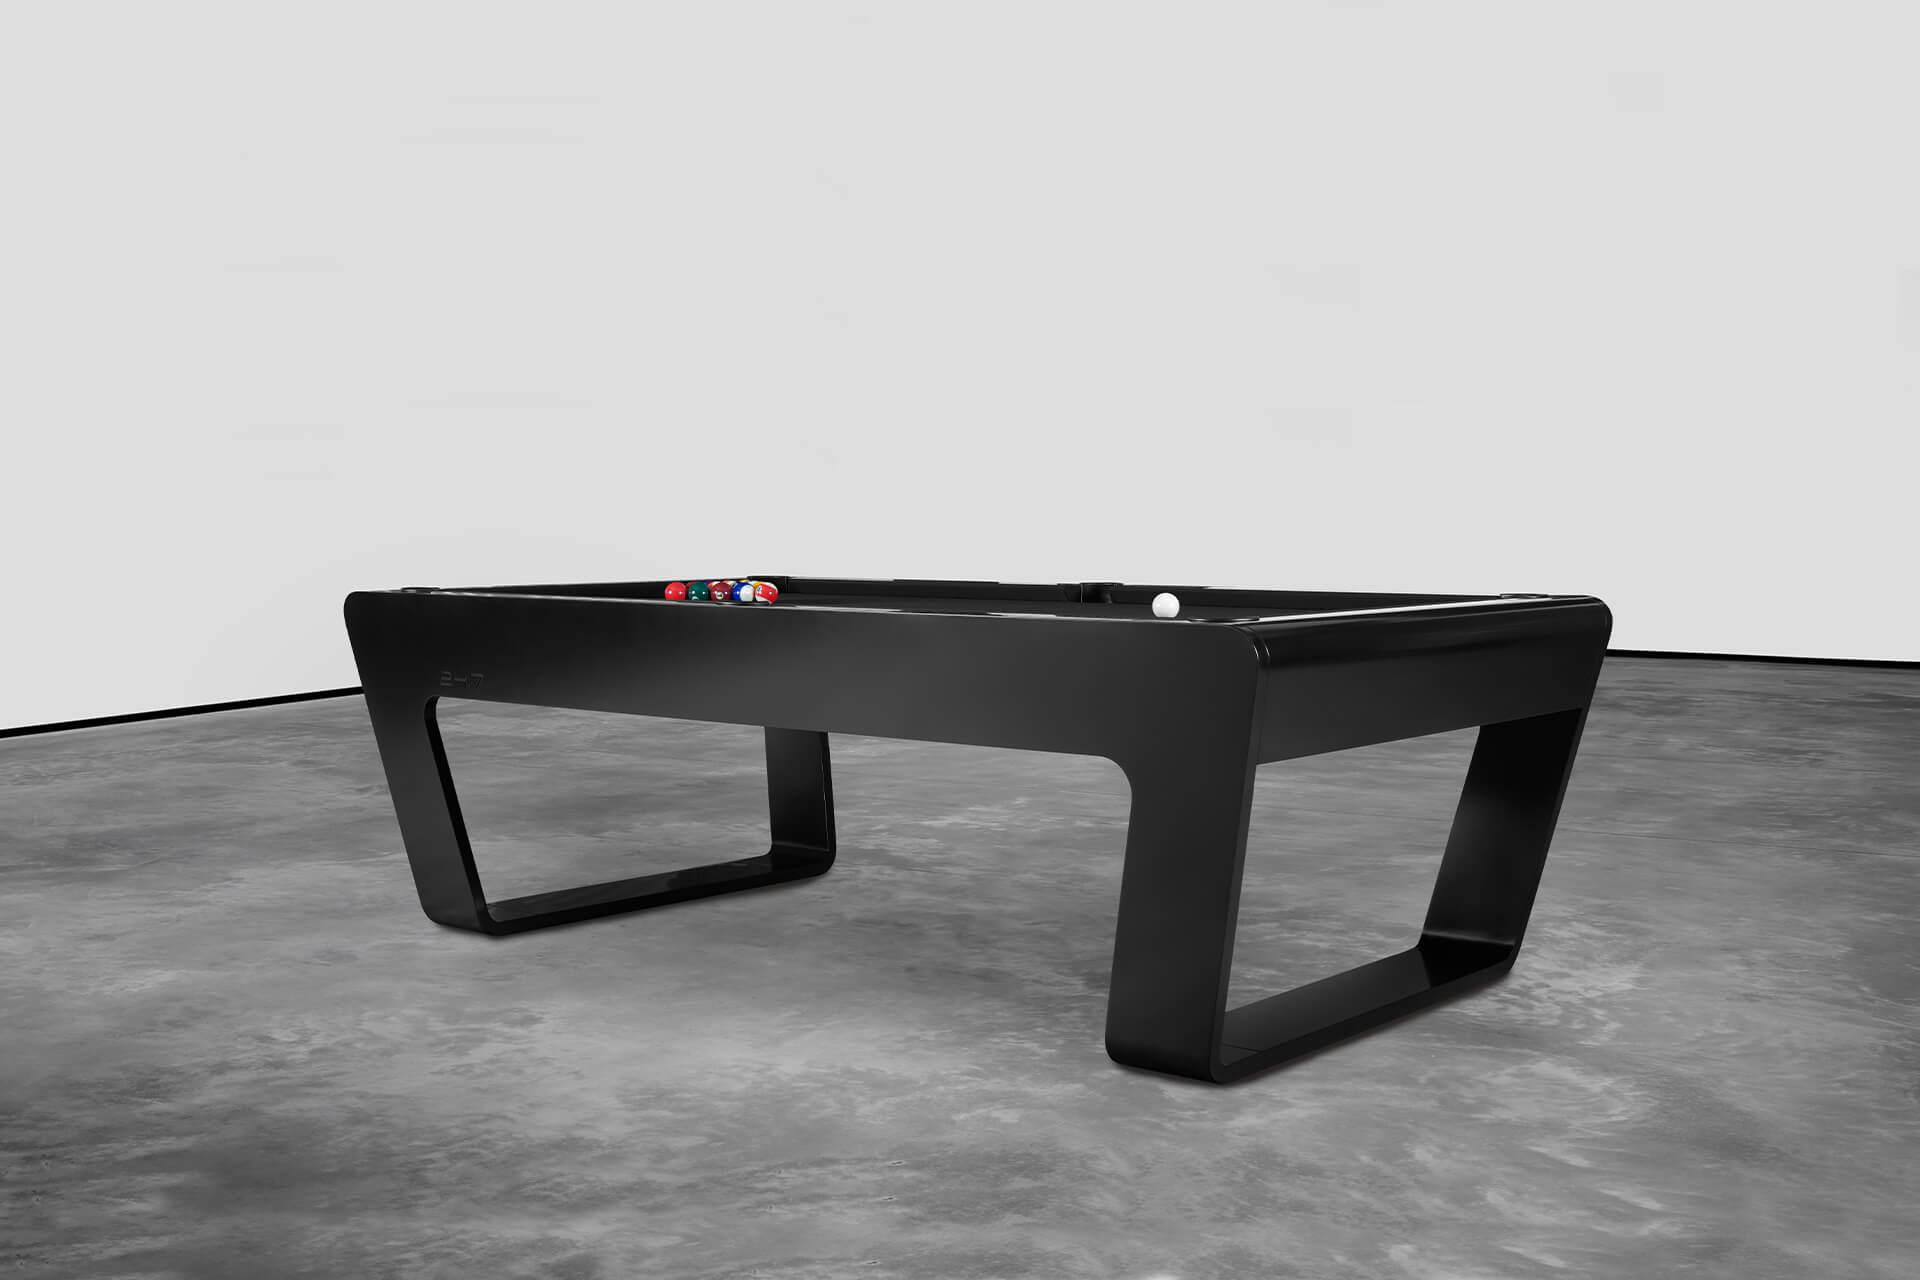 Black high-end pool table